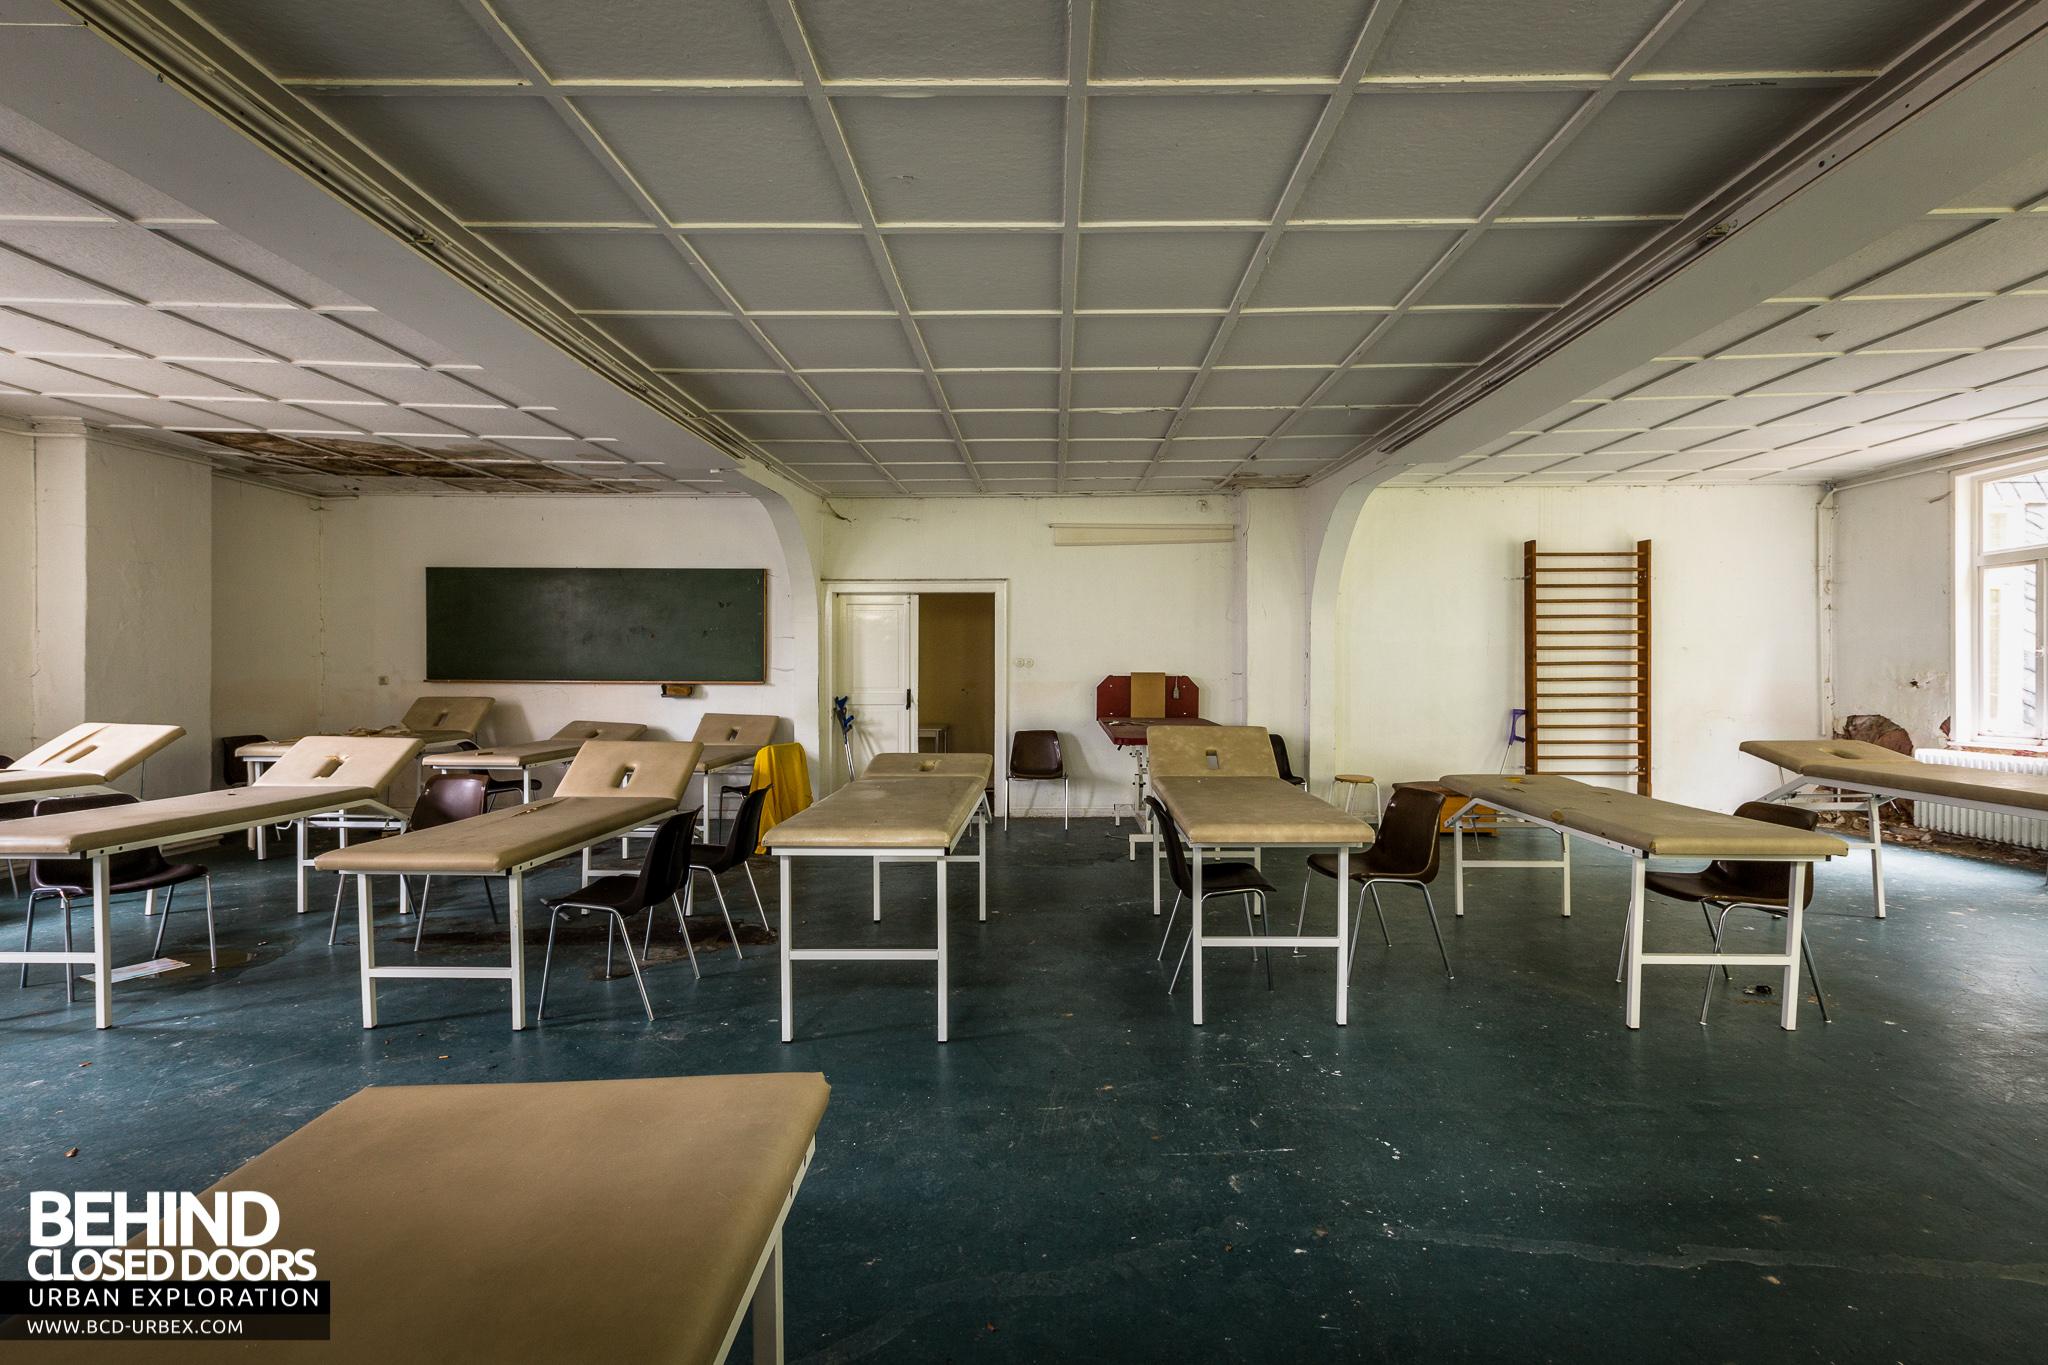 Haus der Anatomie – Physio School, Germany » Urbex | Behind Closed ...